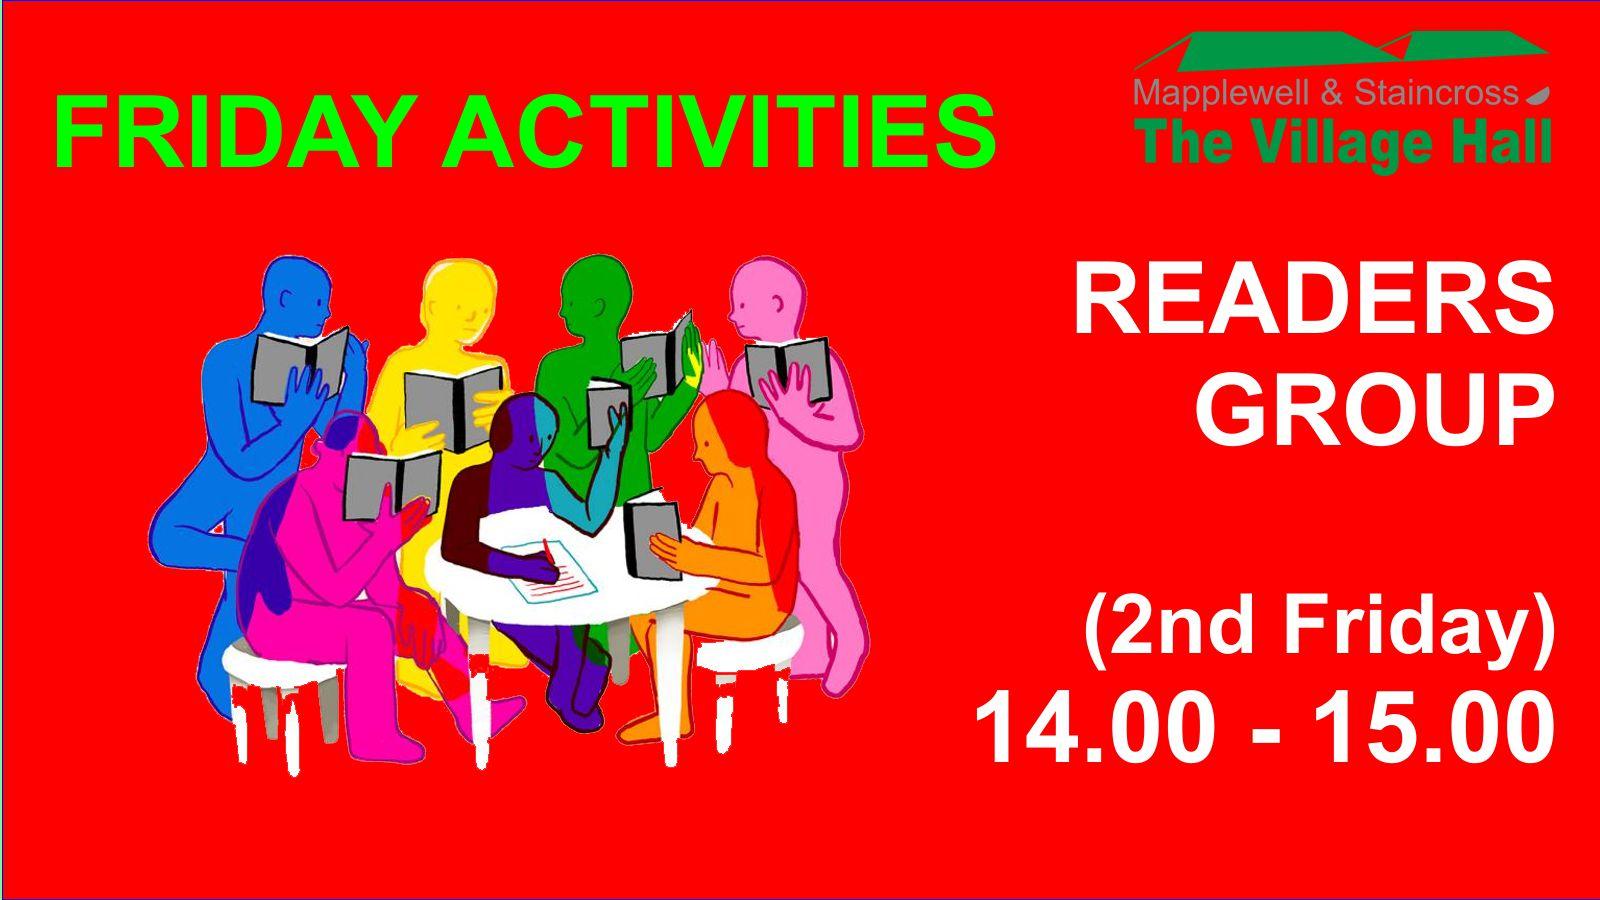 (C) Nick Hibberd Reading Group